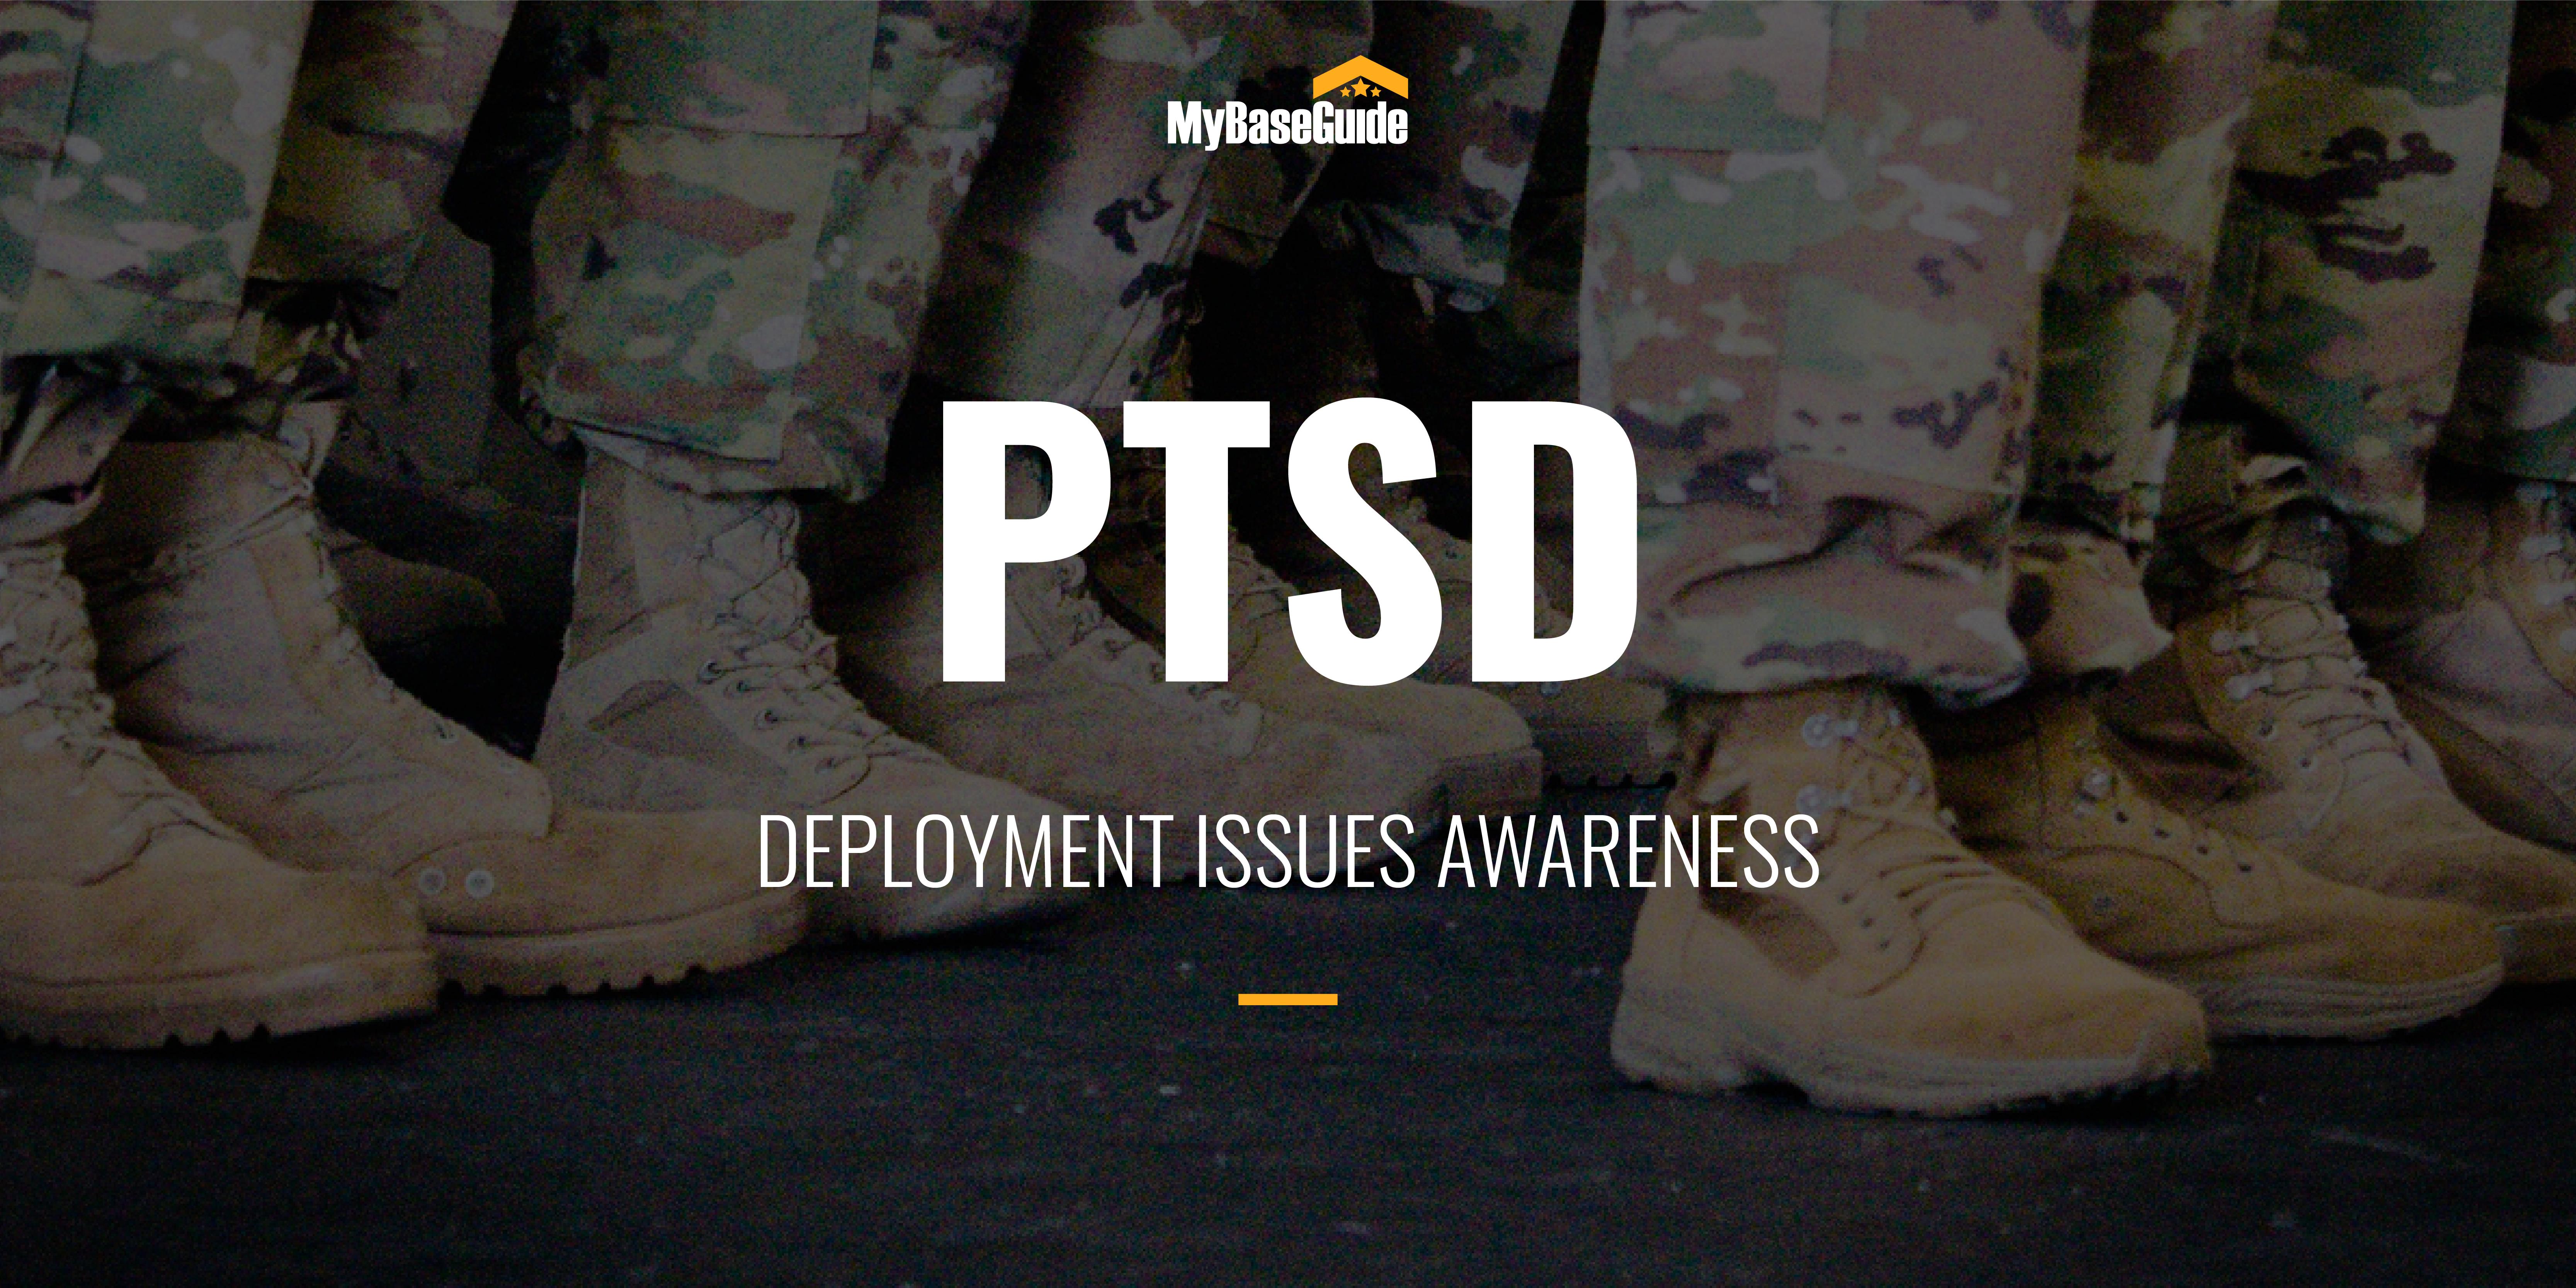 PTSD Deployment Issues Awareness